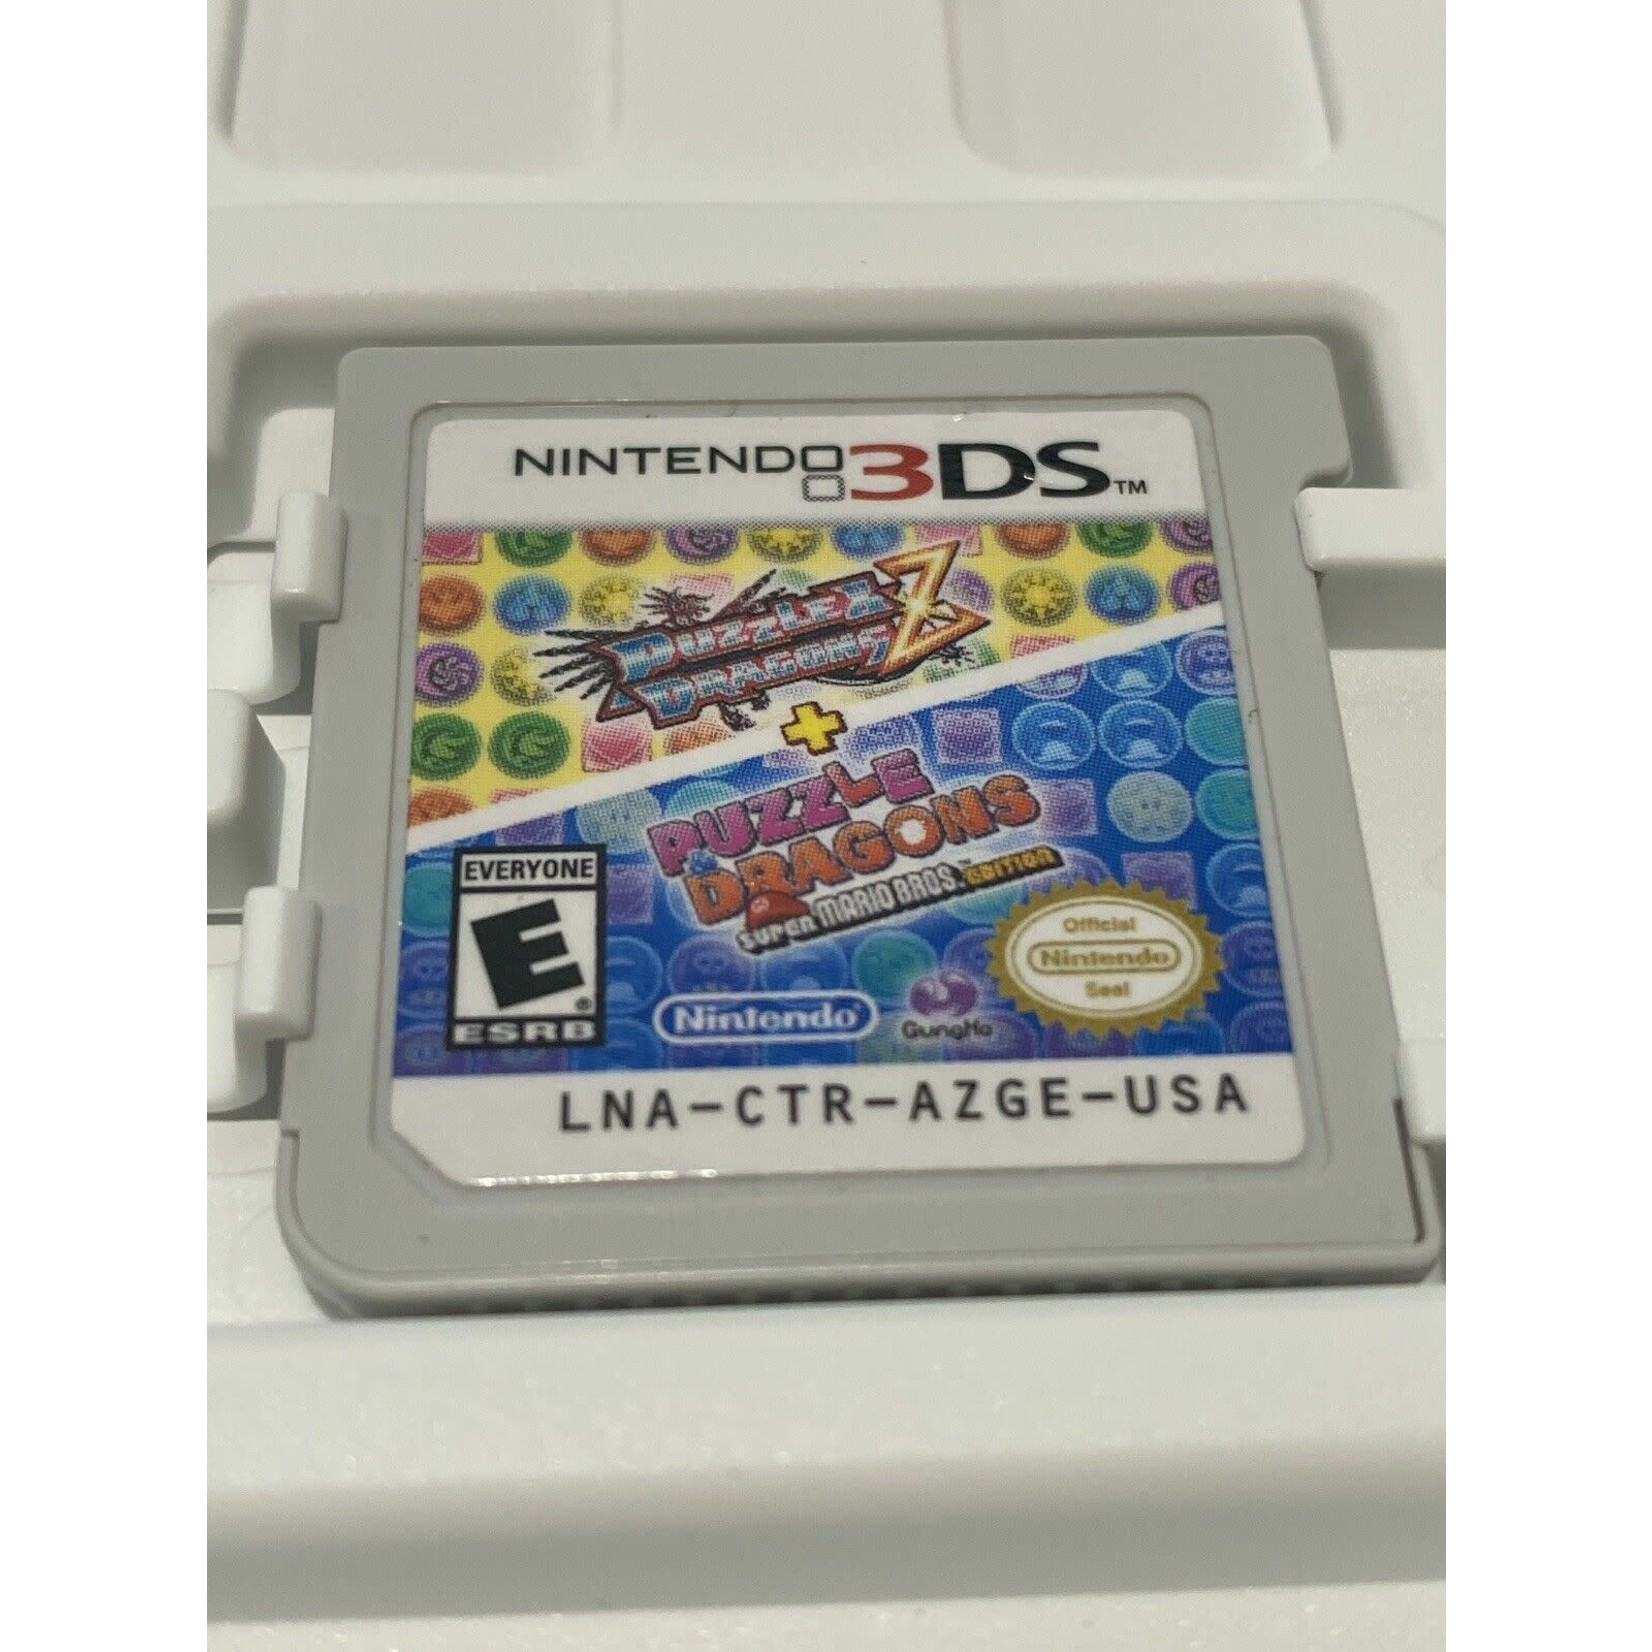 3DSU-Puzzle & Dragons Z + Puzzle & Dragons: Super Mario Bros. Edition (Chip Only)